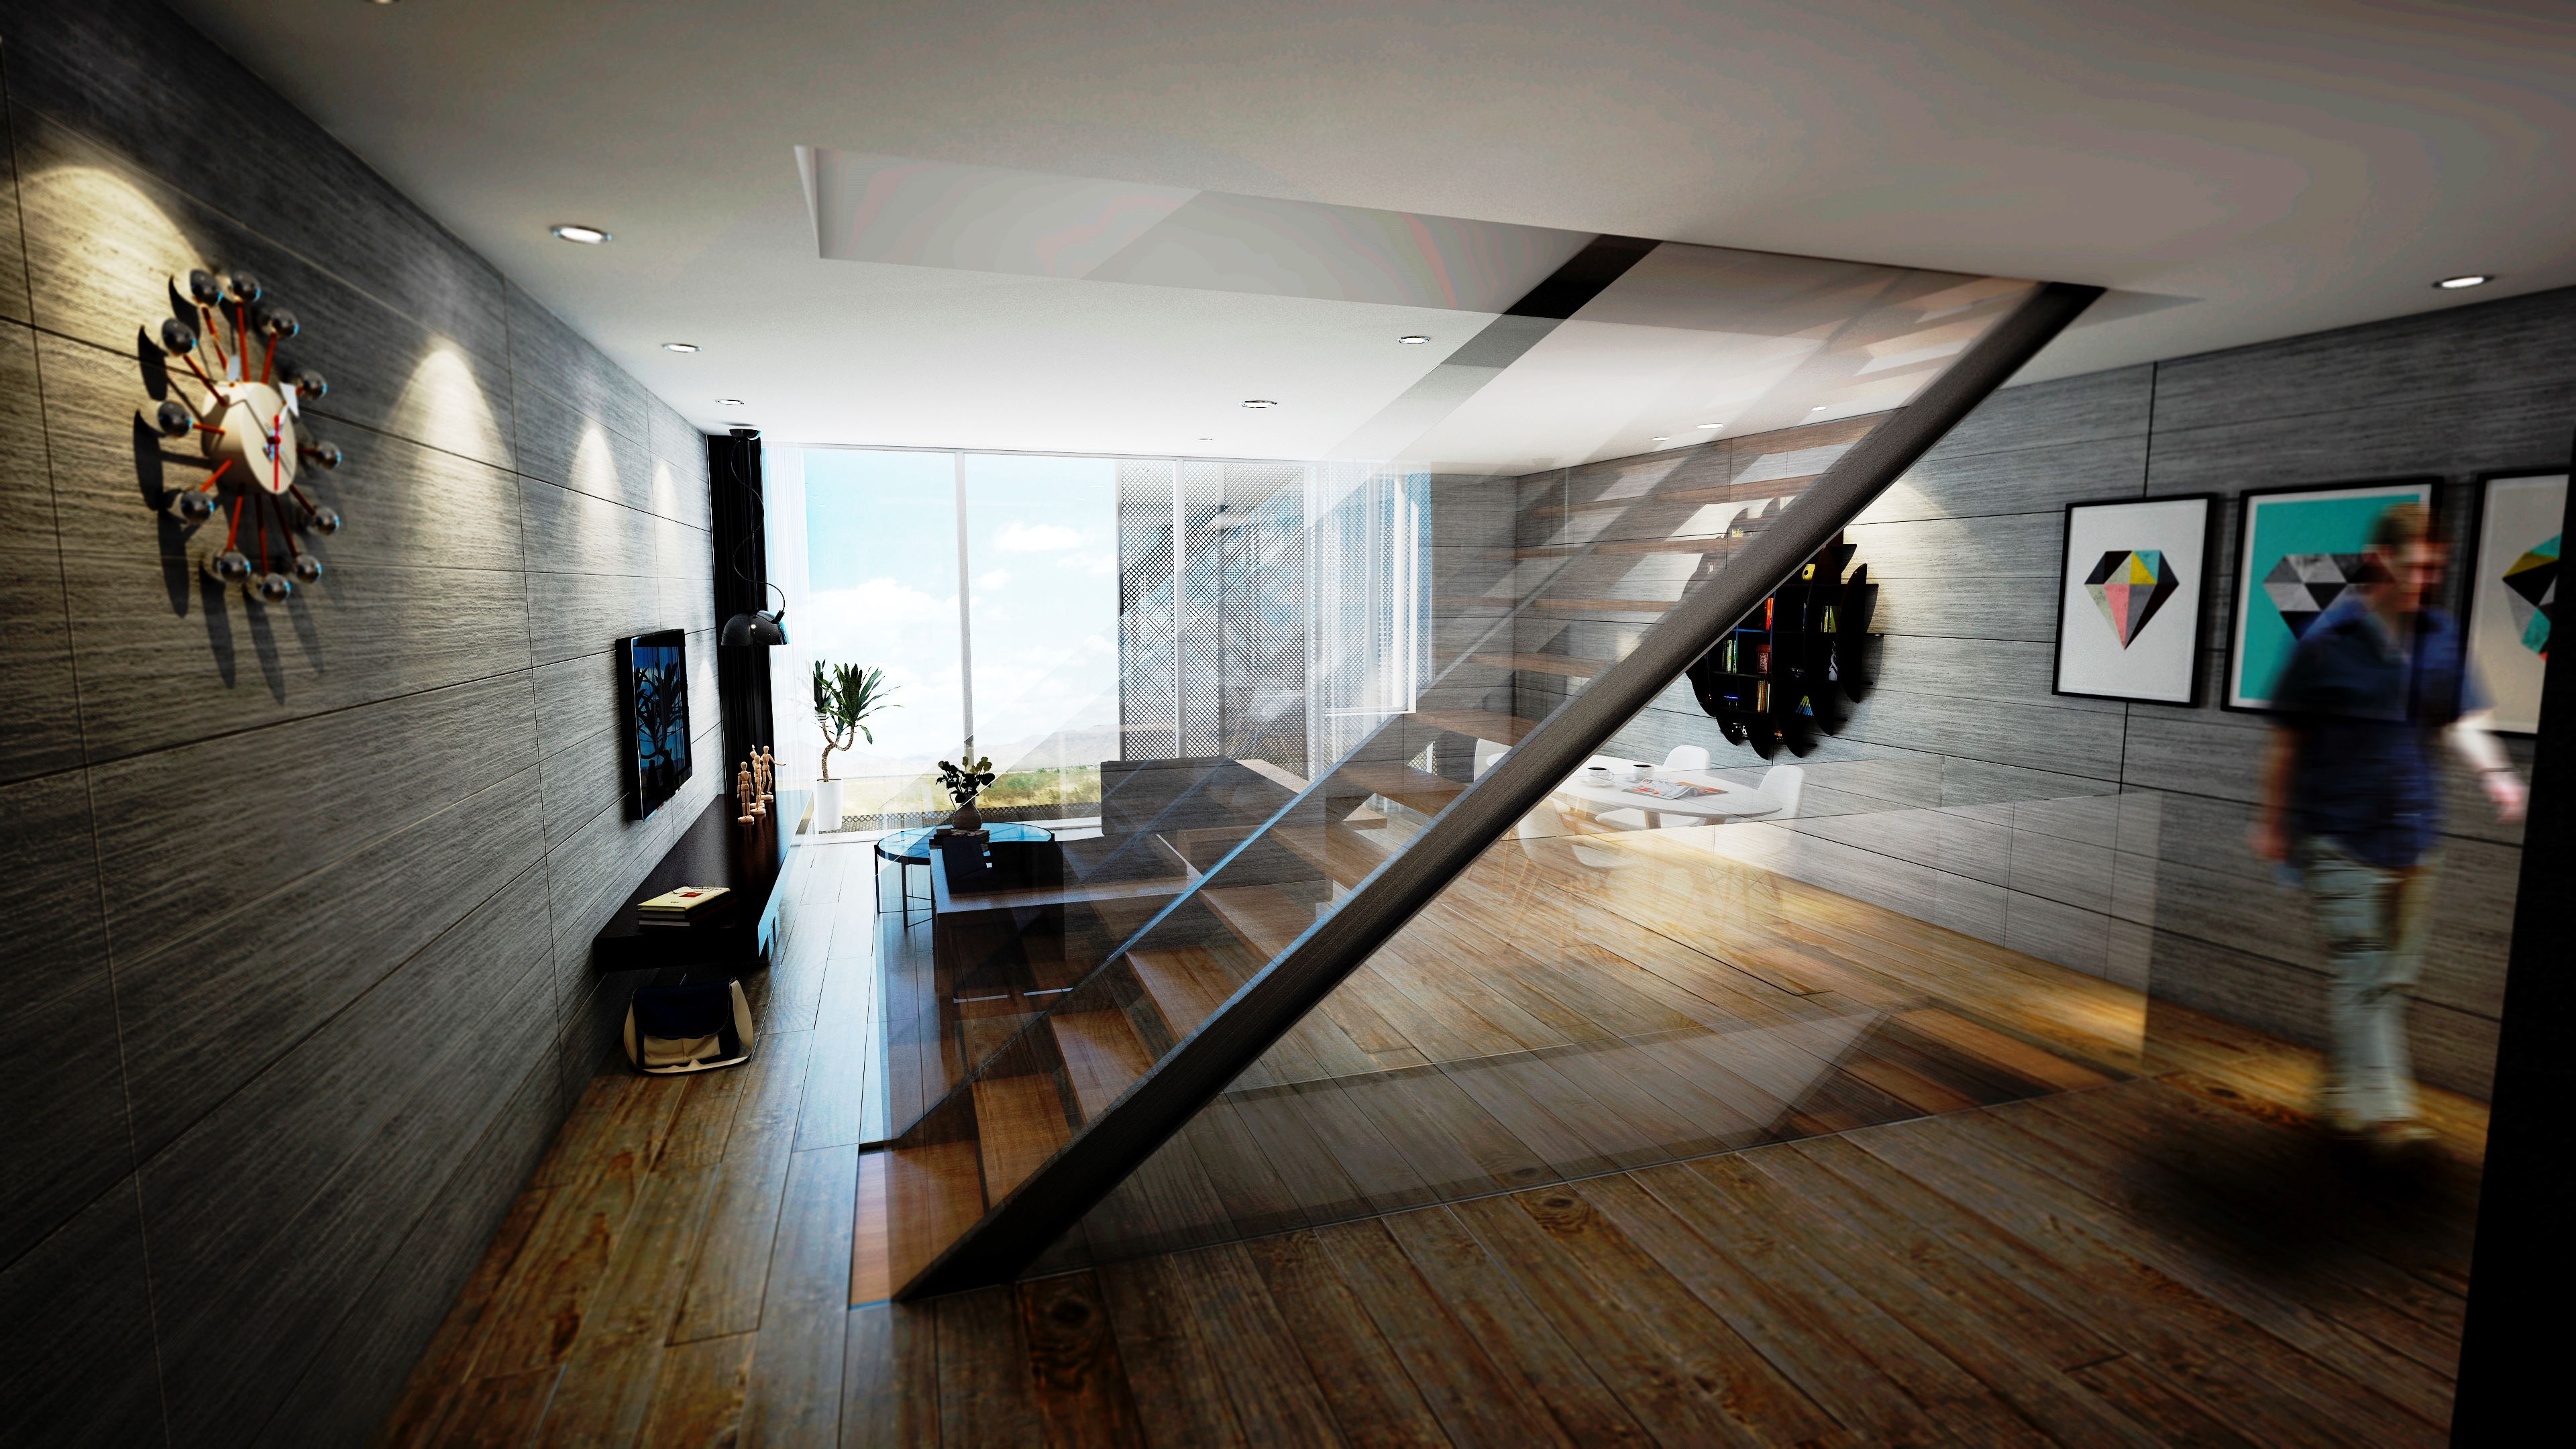 sietequince proyecto viviendas promoción passivhaus salón